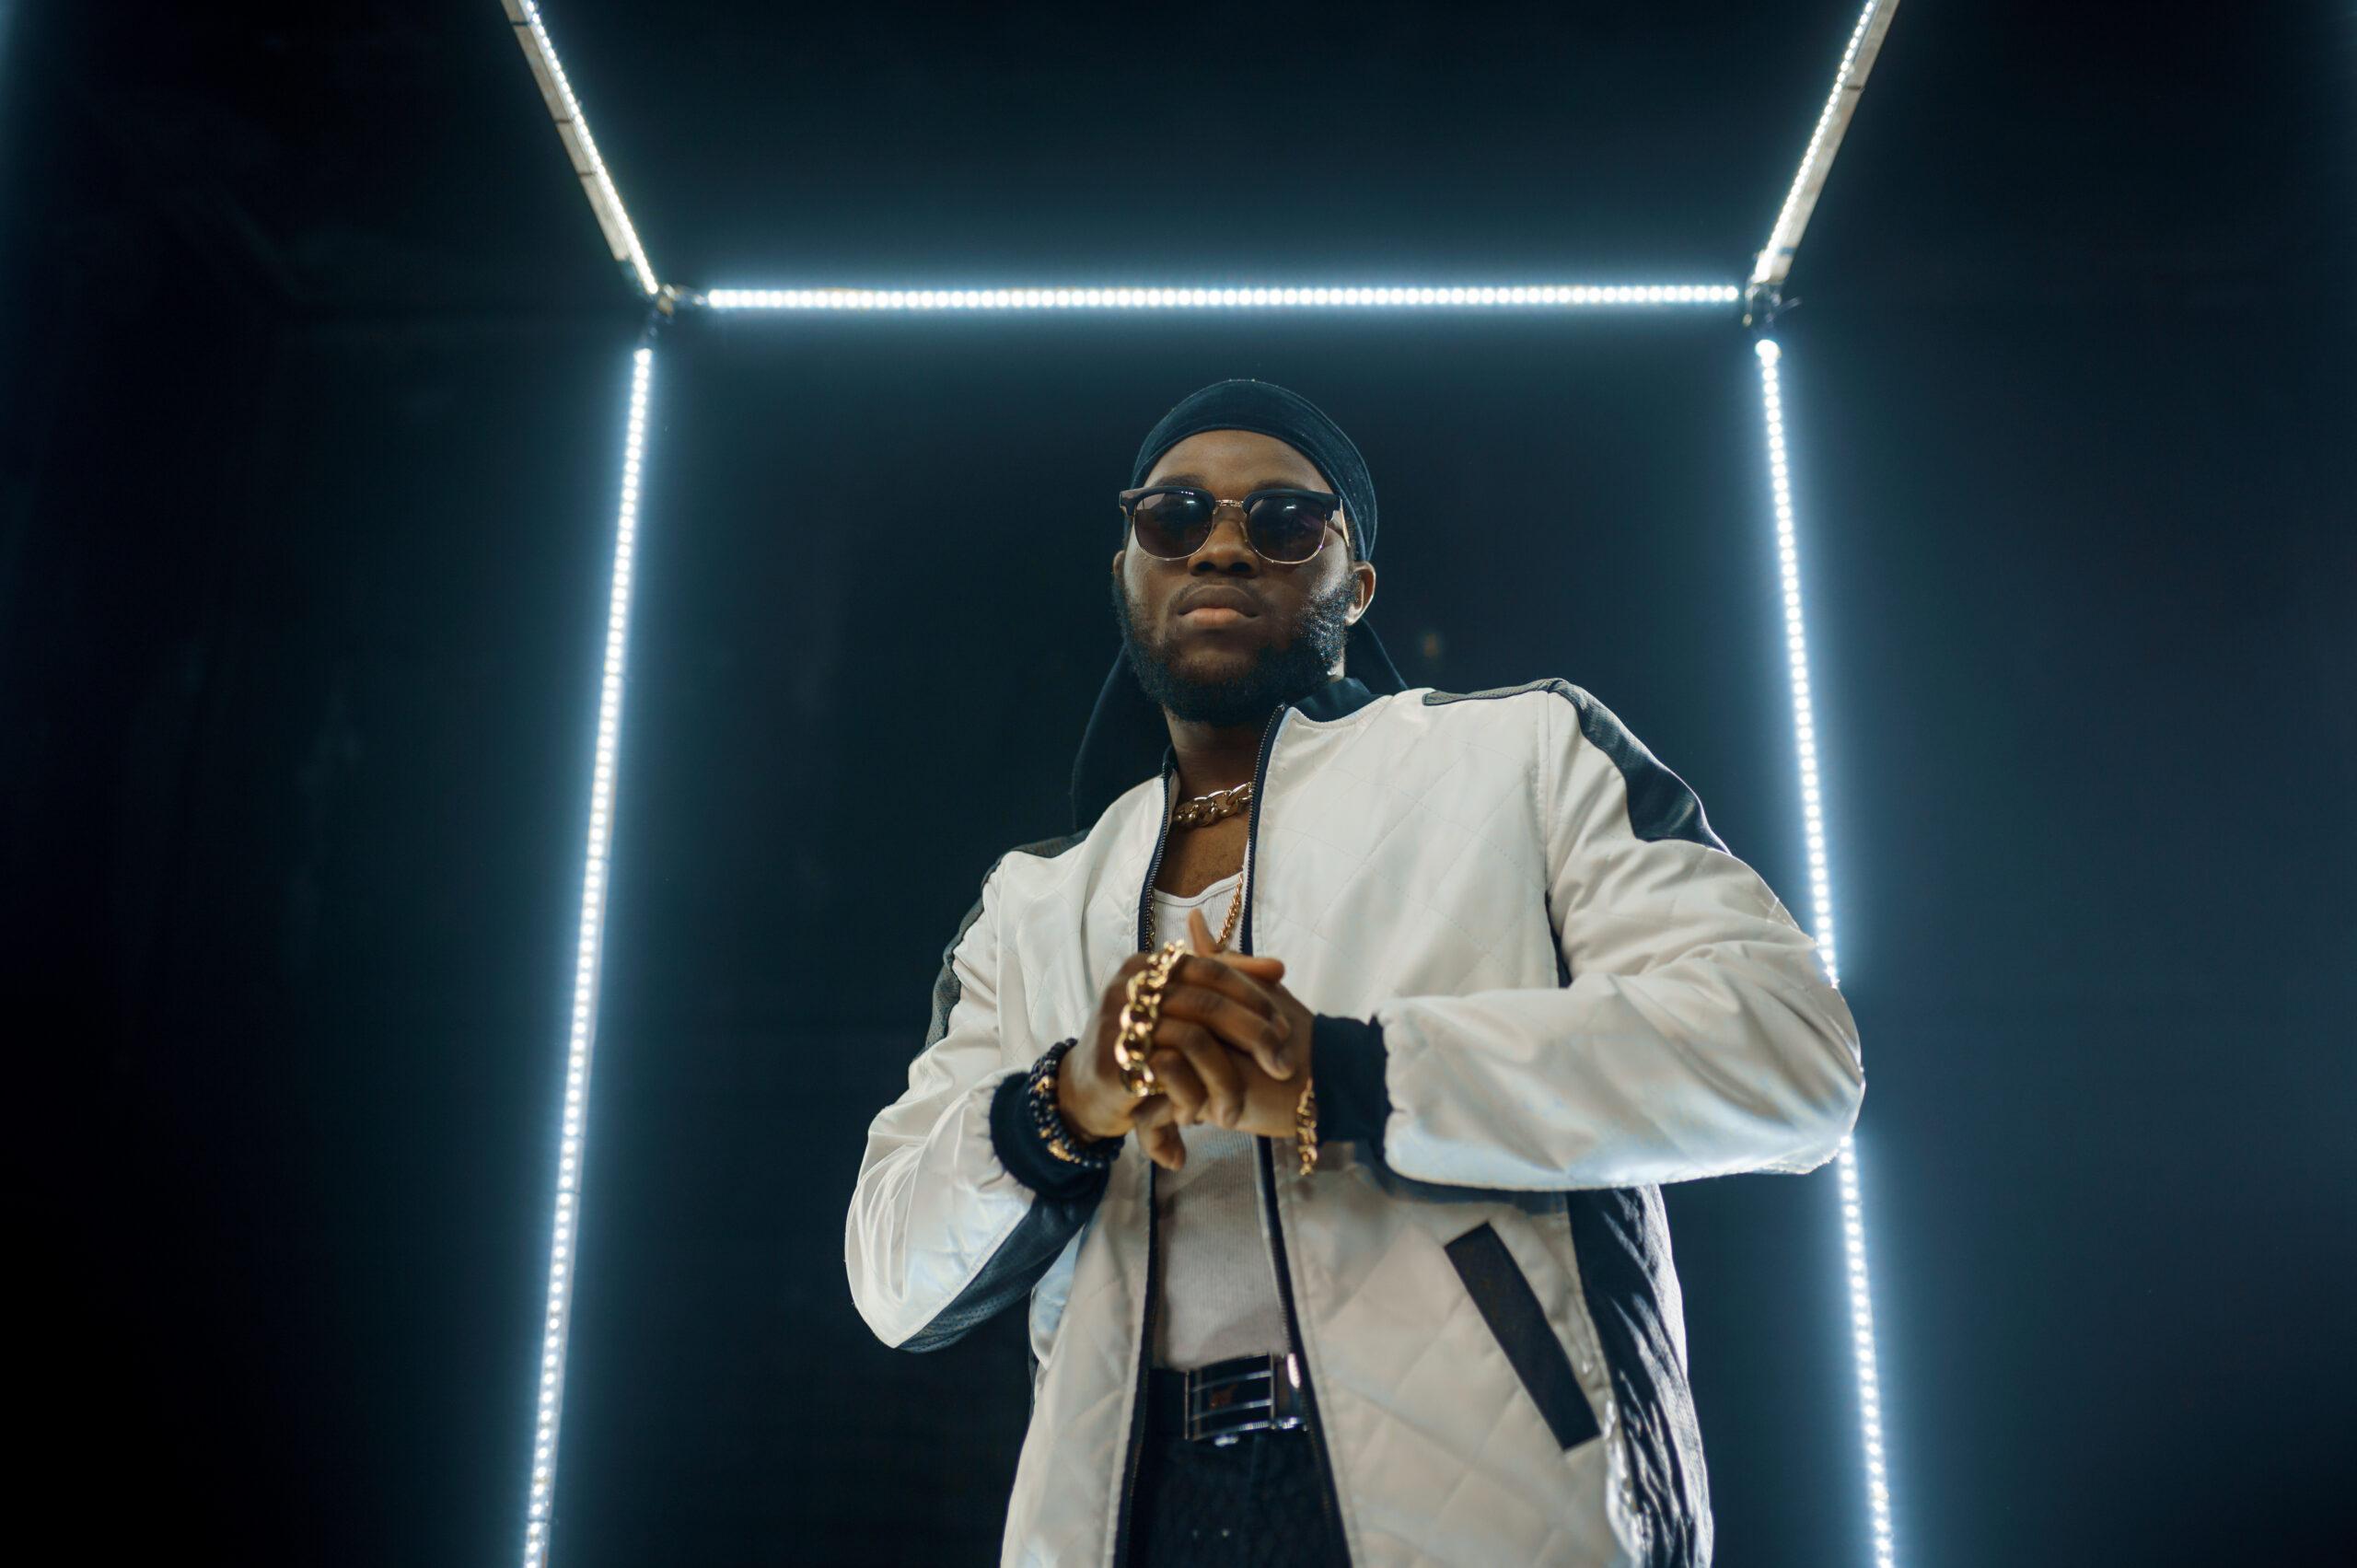 stylish-hip-hop-rapper-in-sunglasses-dark-background